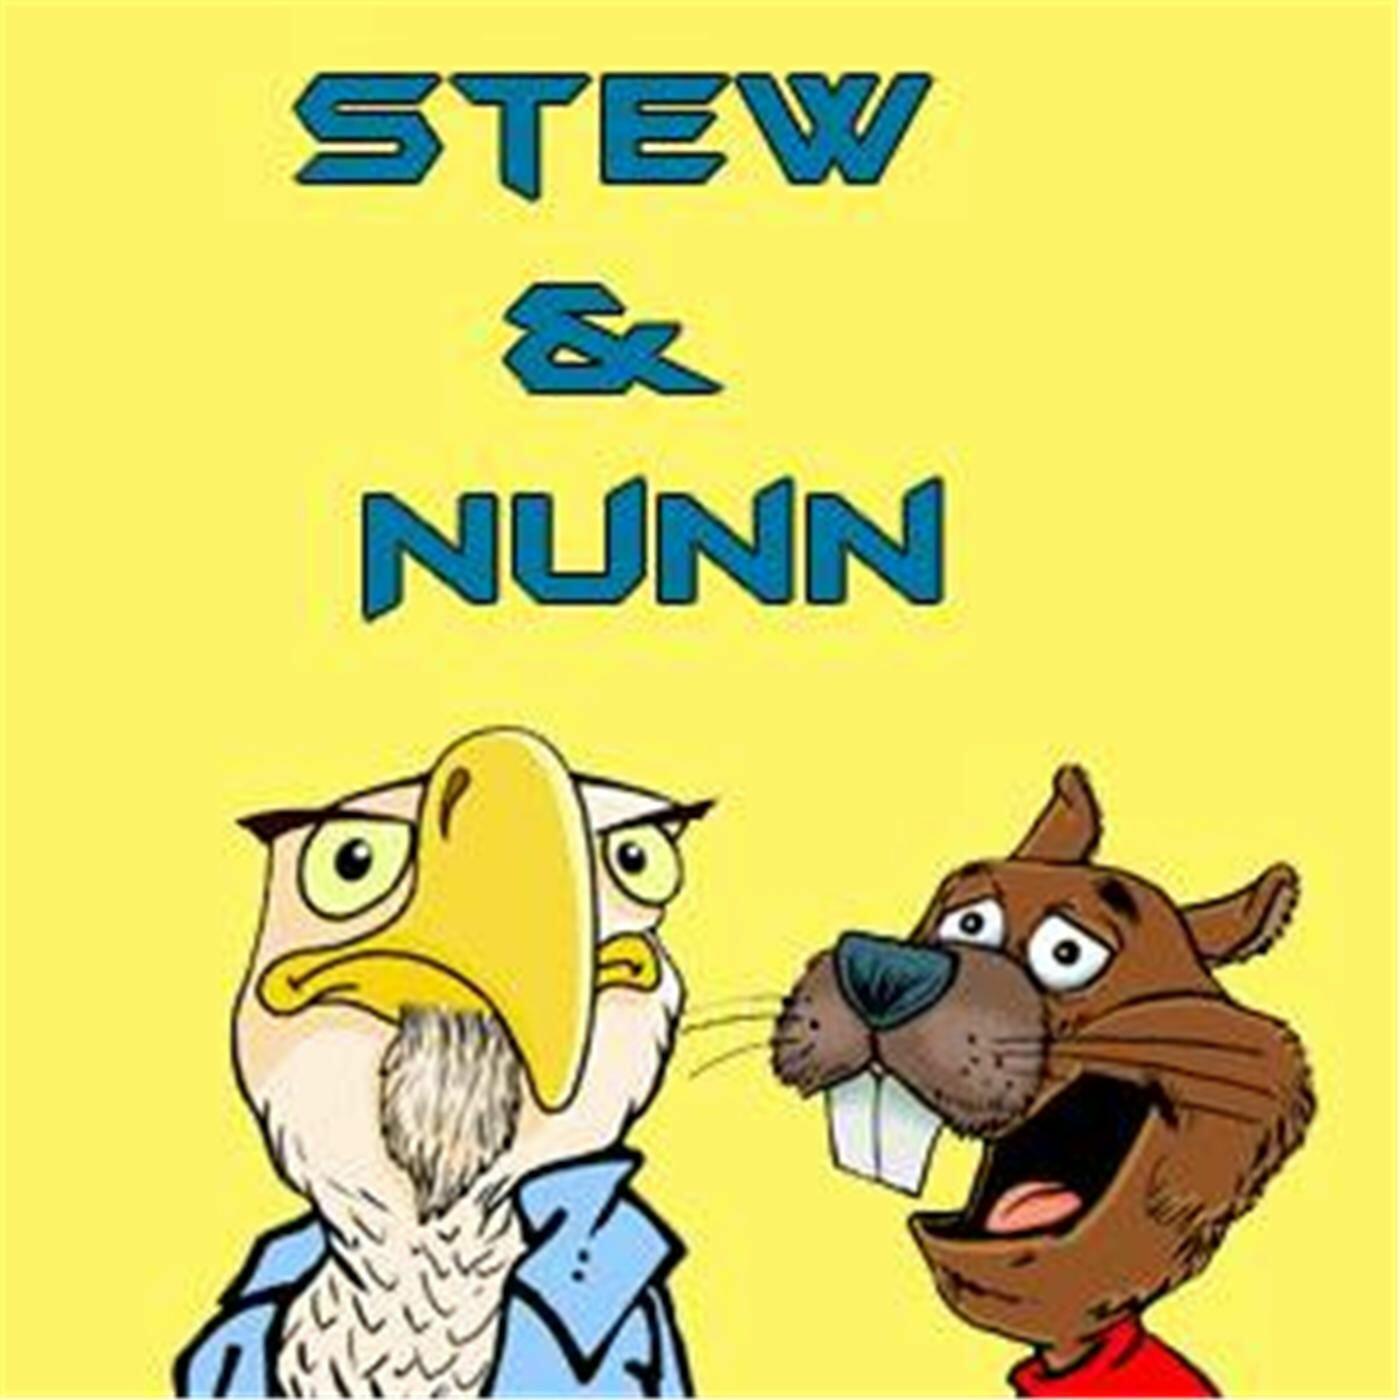 Stew and the Nunn